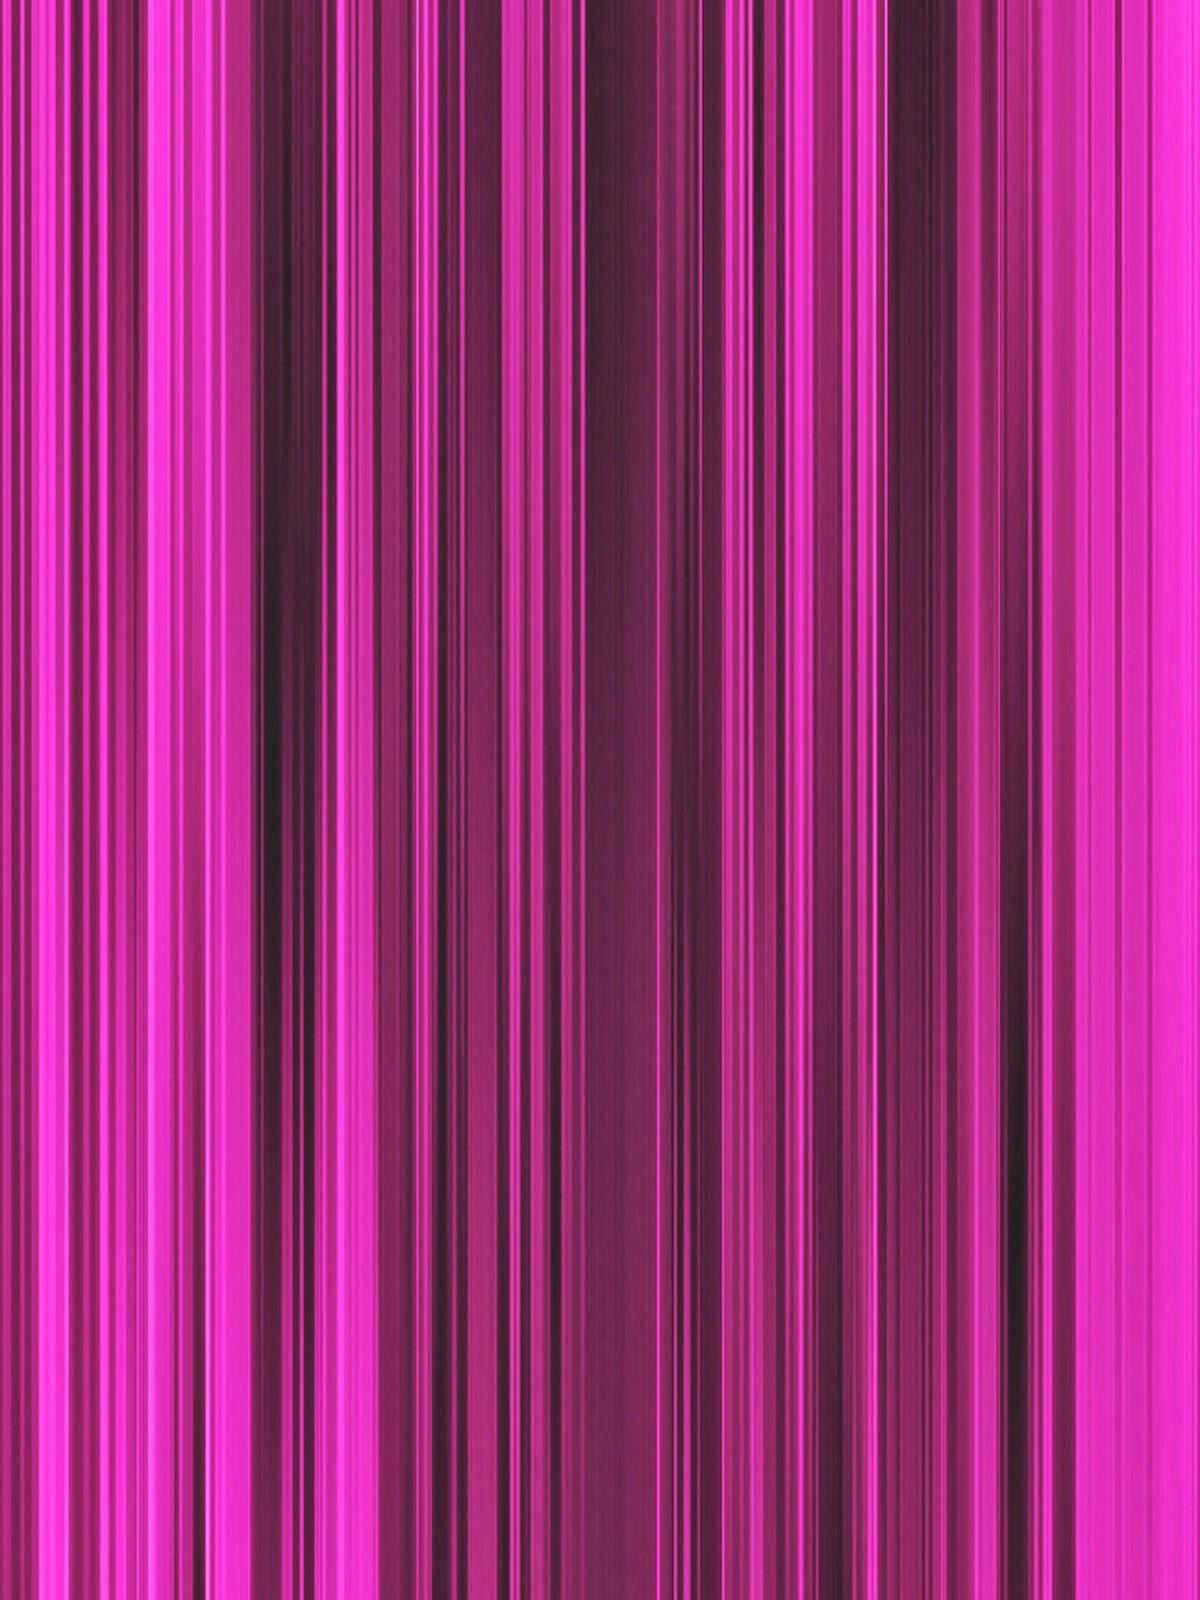 Stripes Barcode Freebie Background Printables